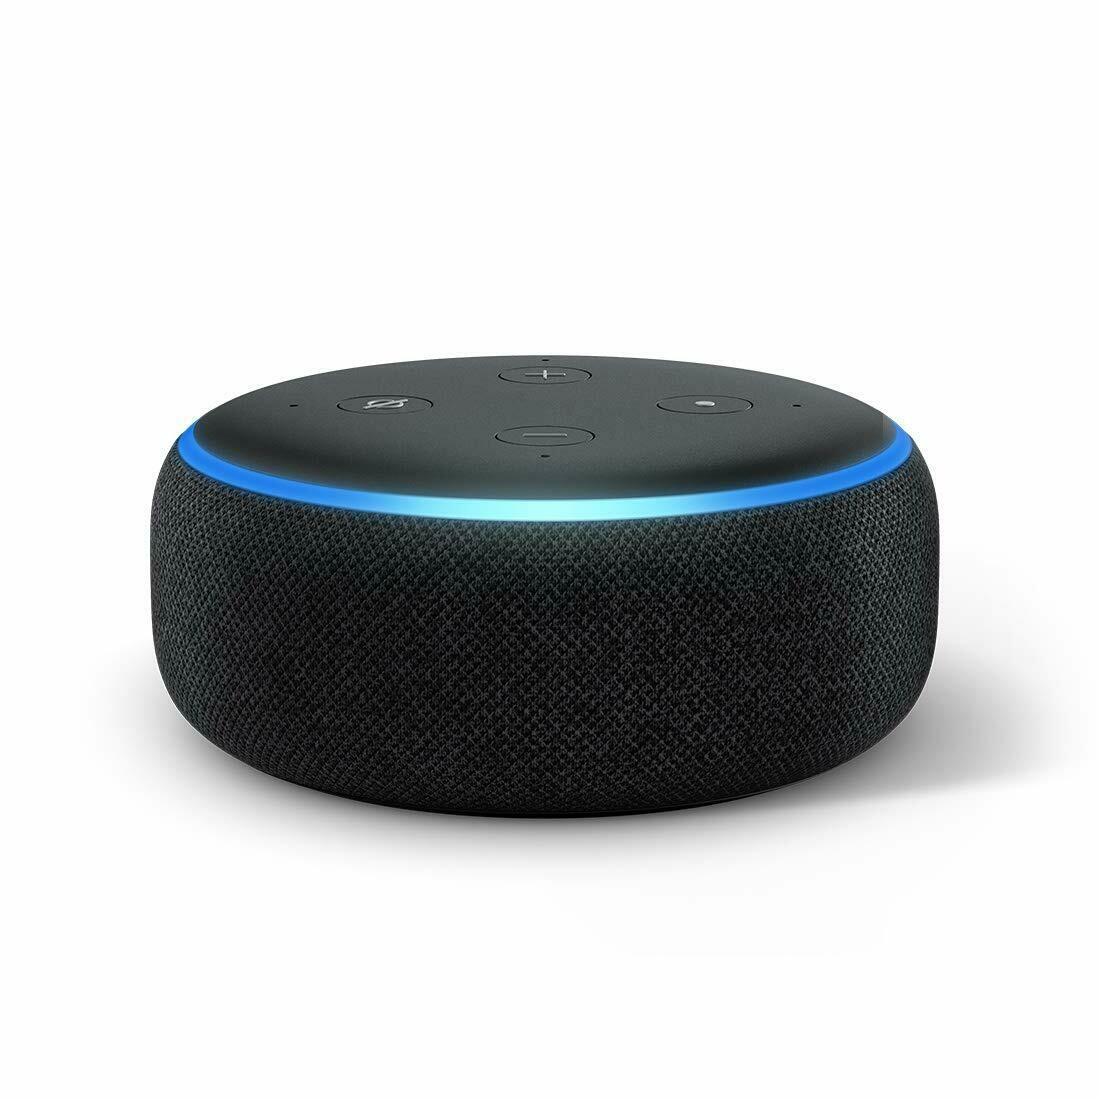 Amazon Echo Dot 3rd Gen Smart speaker with Alexa, Black